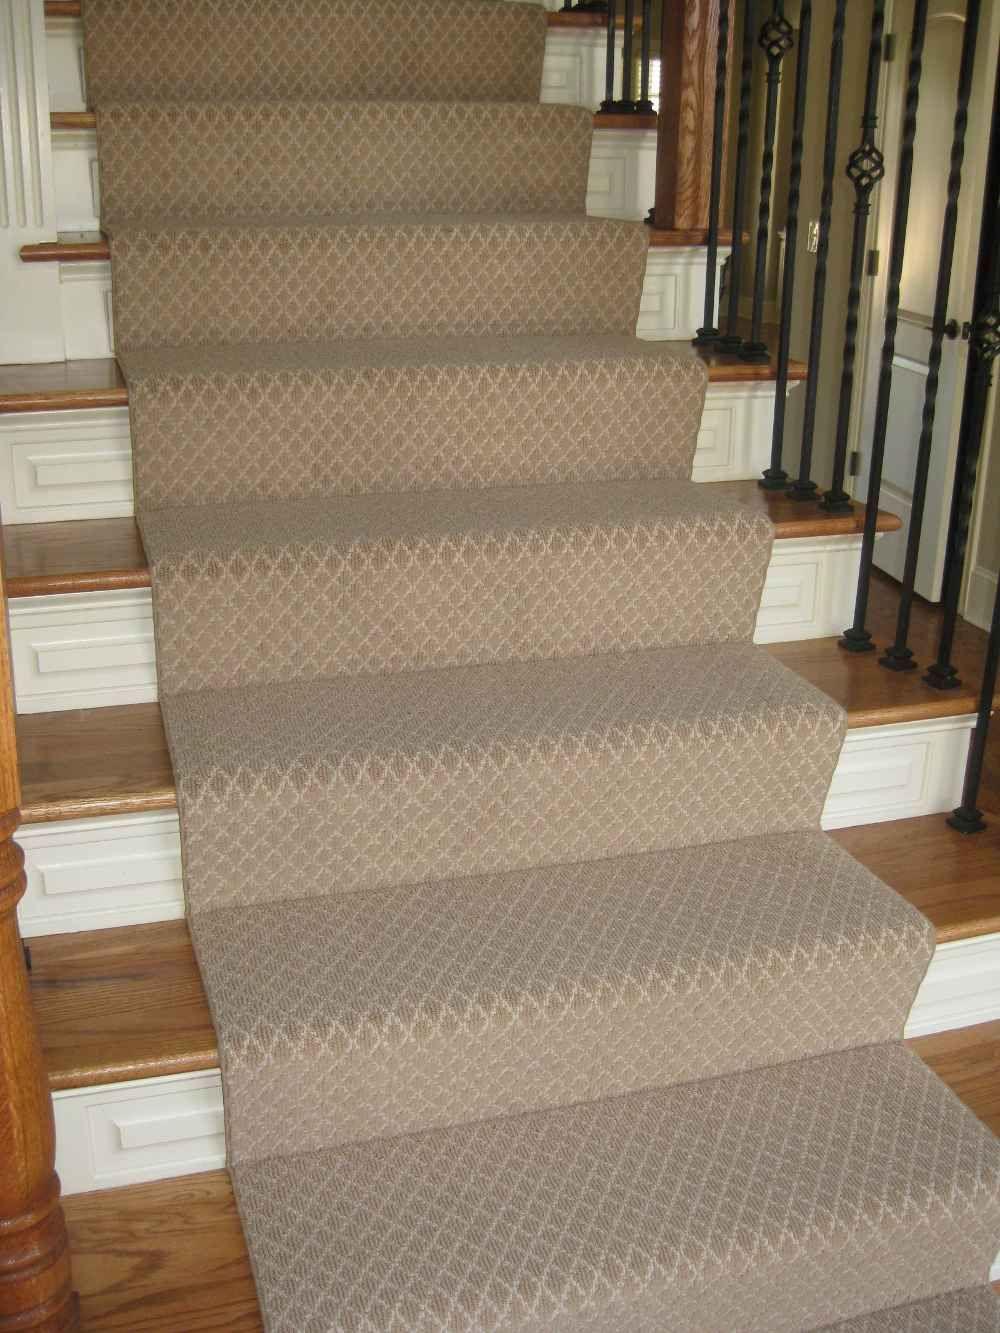 Best Custom Couristan Carpet Home Stair Runner Jpg 1 000×1 333 640 x 480